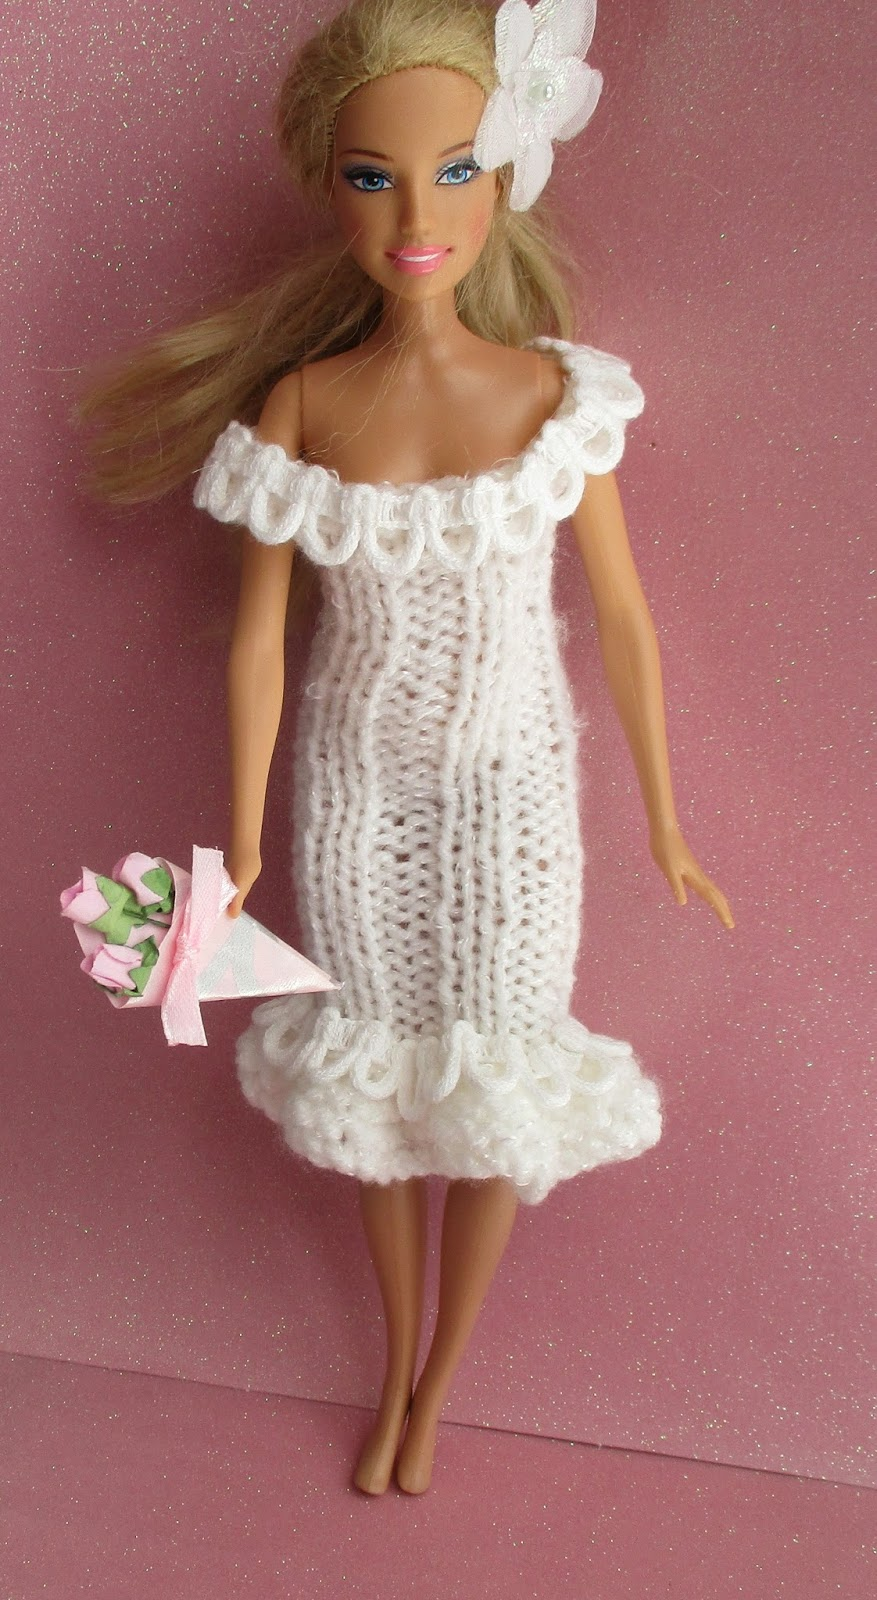 Taffy Lass Knits: Glamour Wedding Dress for Barbie